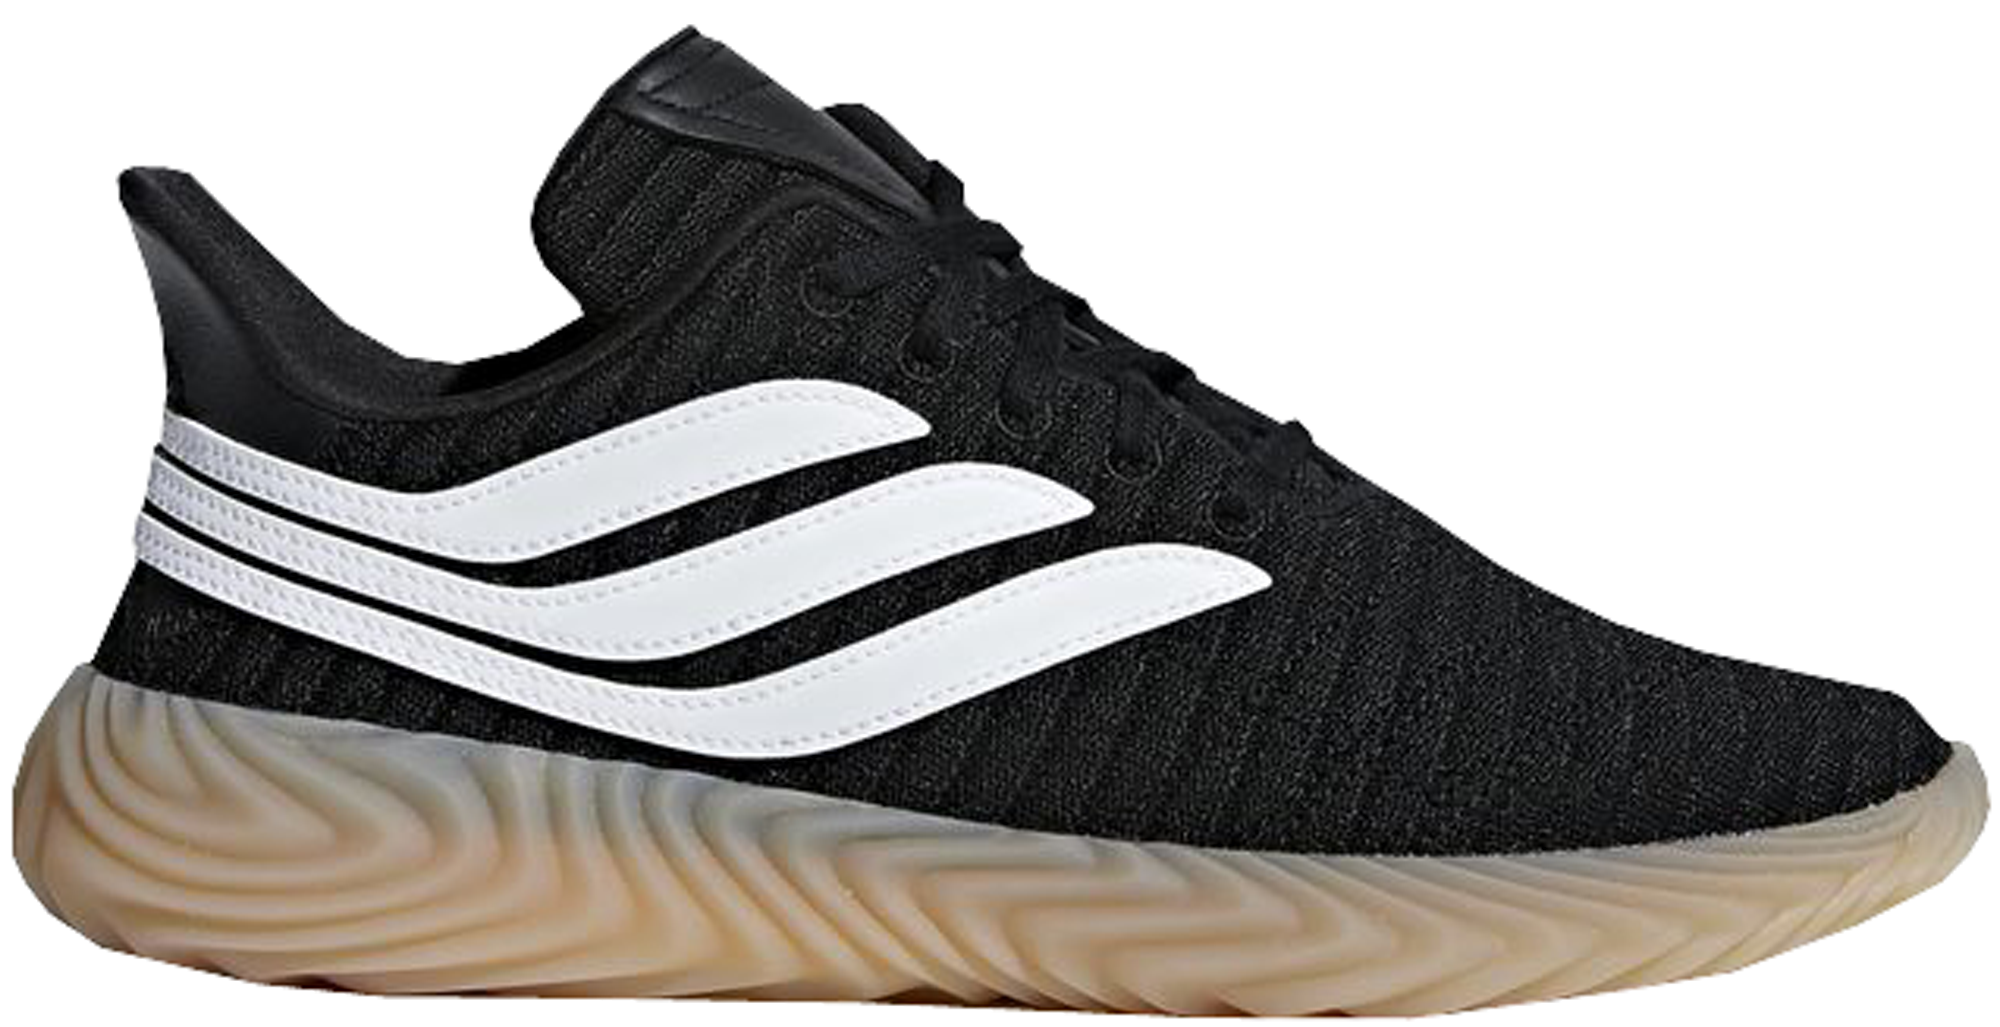 adidas Sobakov Black White Gum